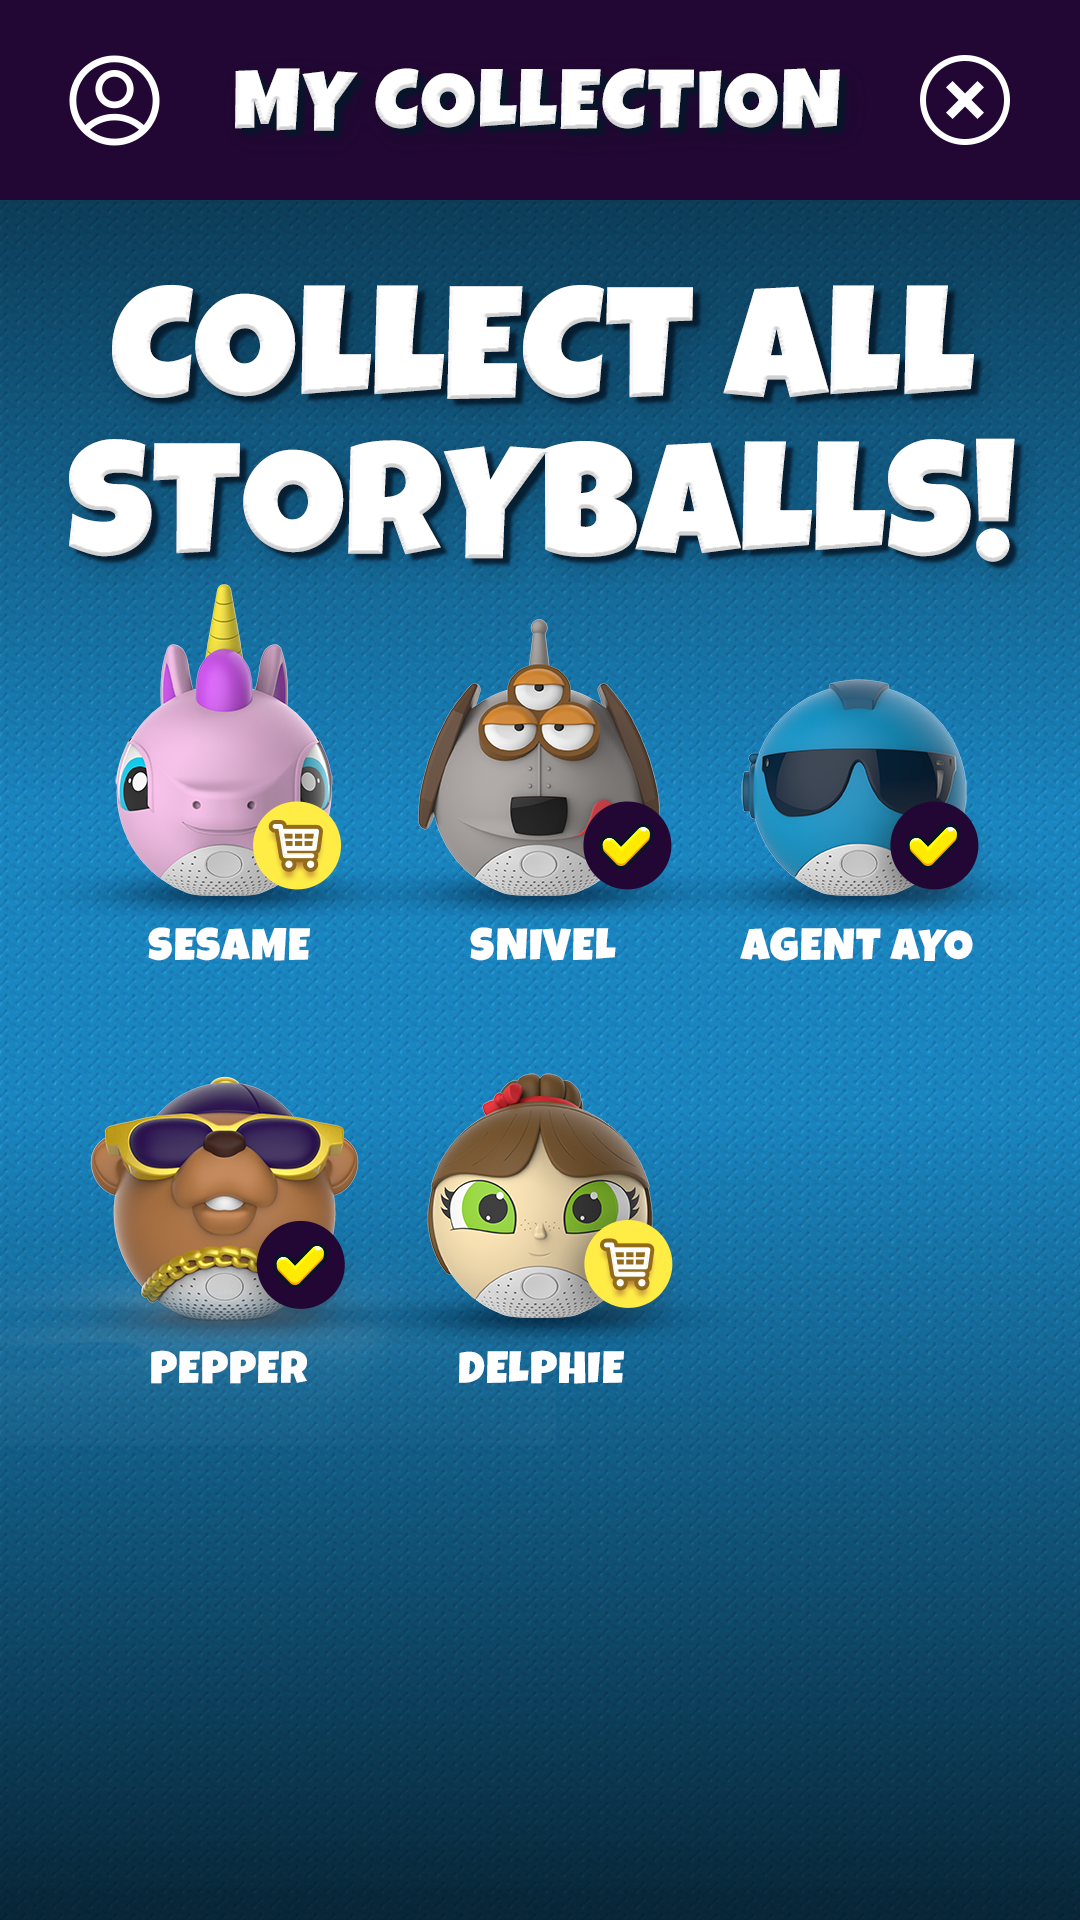 storyball_cataloguecollect sb.png